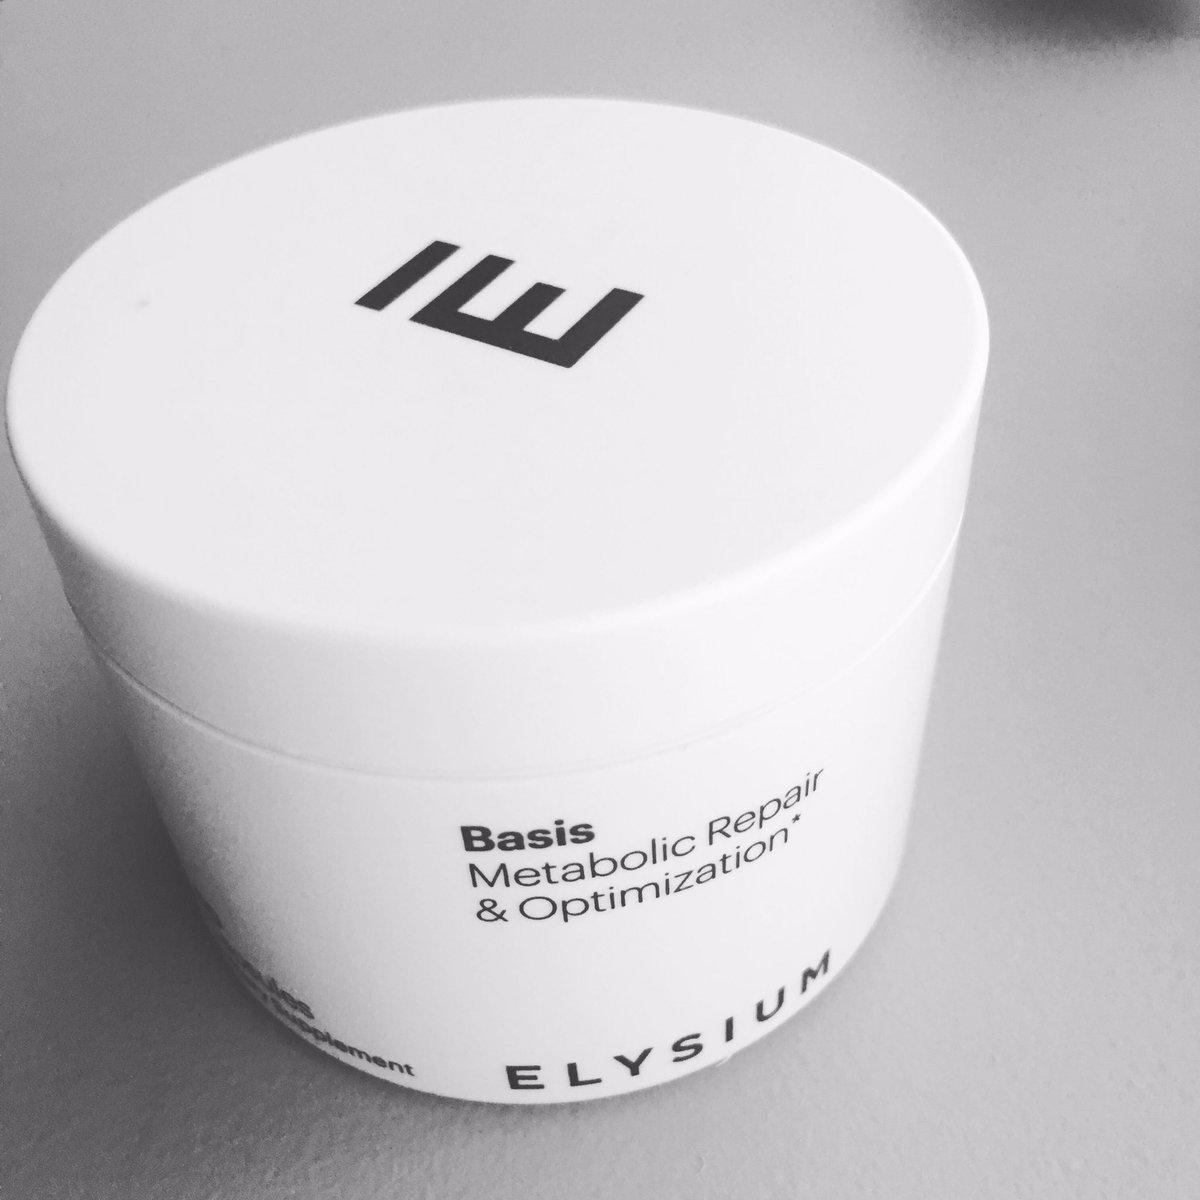 elysium basis supplement - HD1200×1200